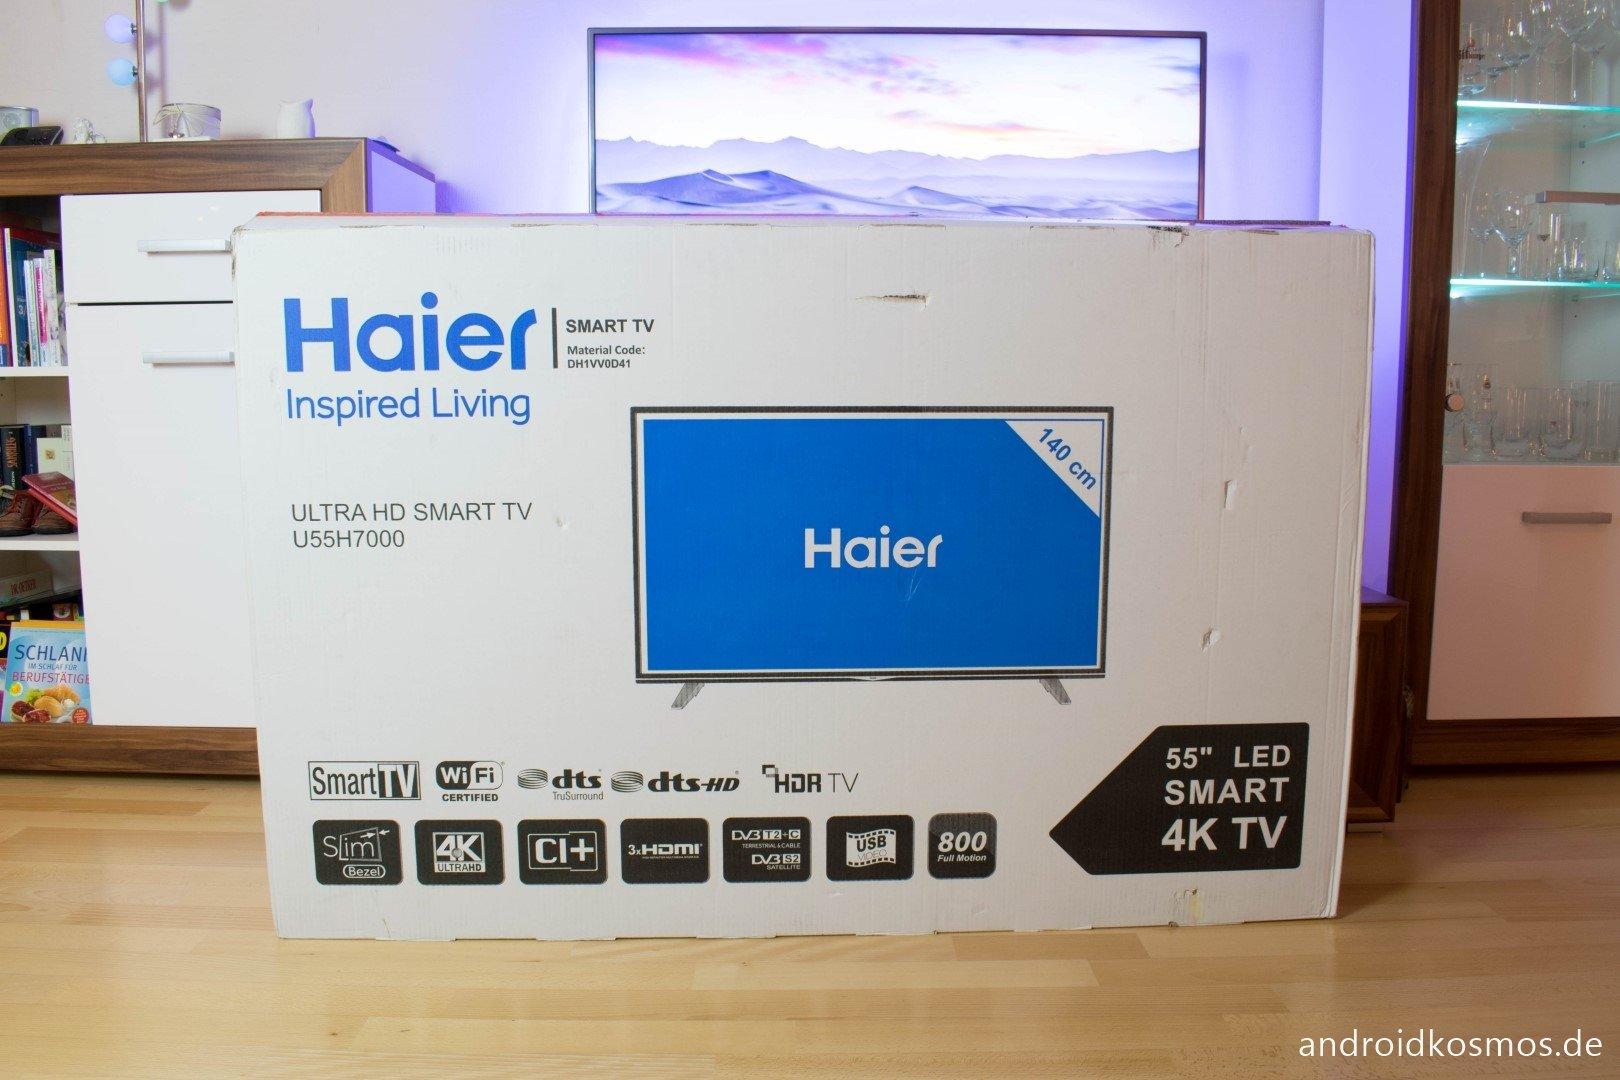 haier u55h7000 tv der g nstige 55 zoll 4k fernseher im test. Black Bedroom Furniture Sets. Home Design Ideas